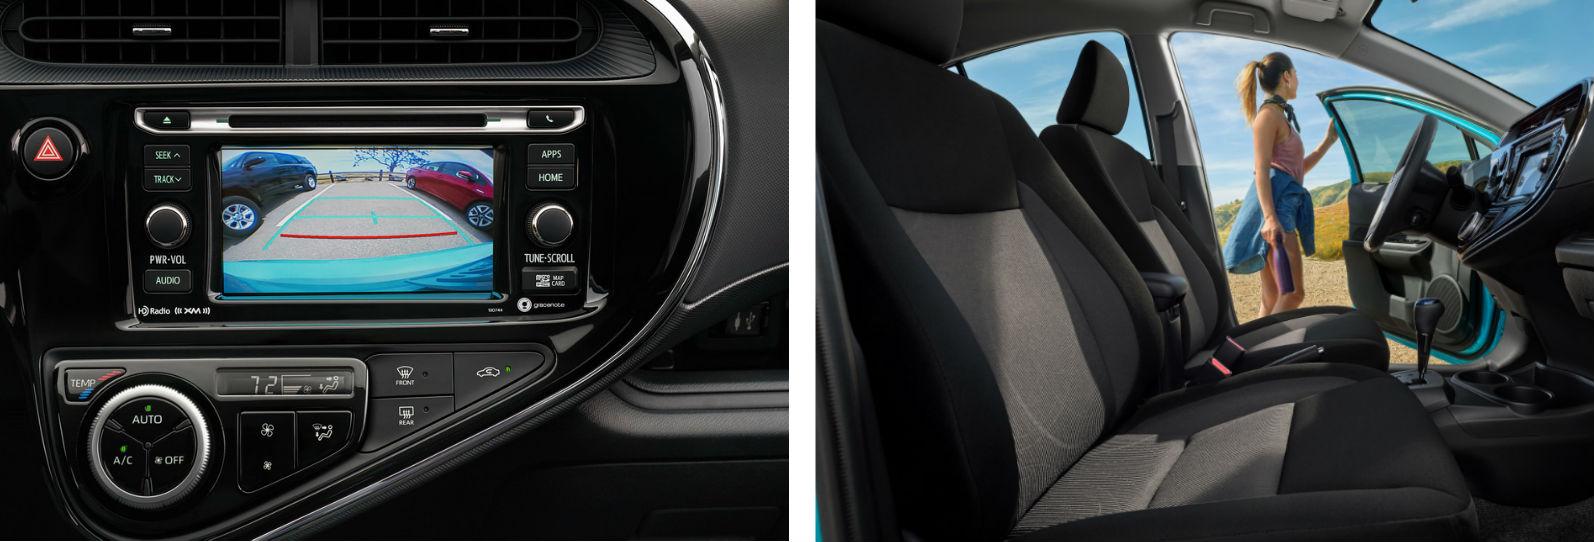 2019 Toyota Prius C Interior - Gilroy, CA